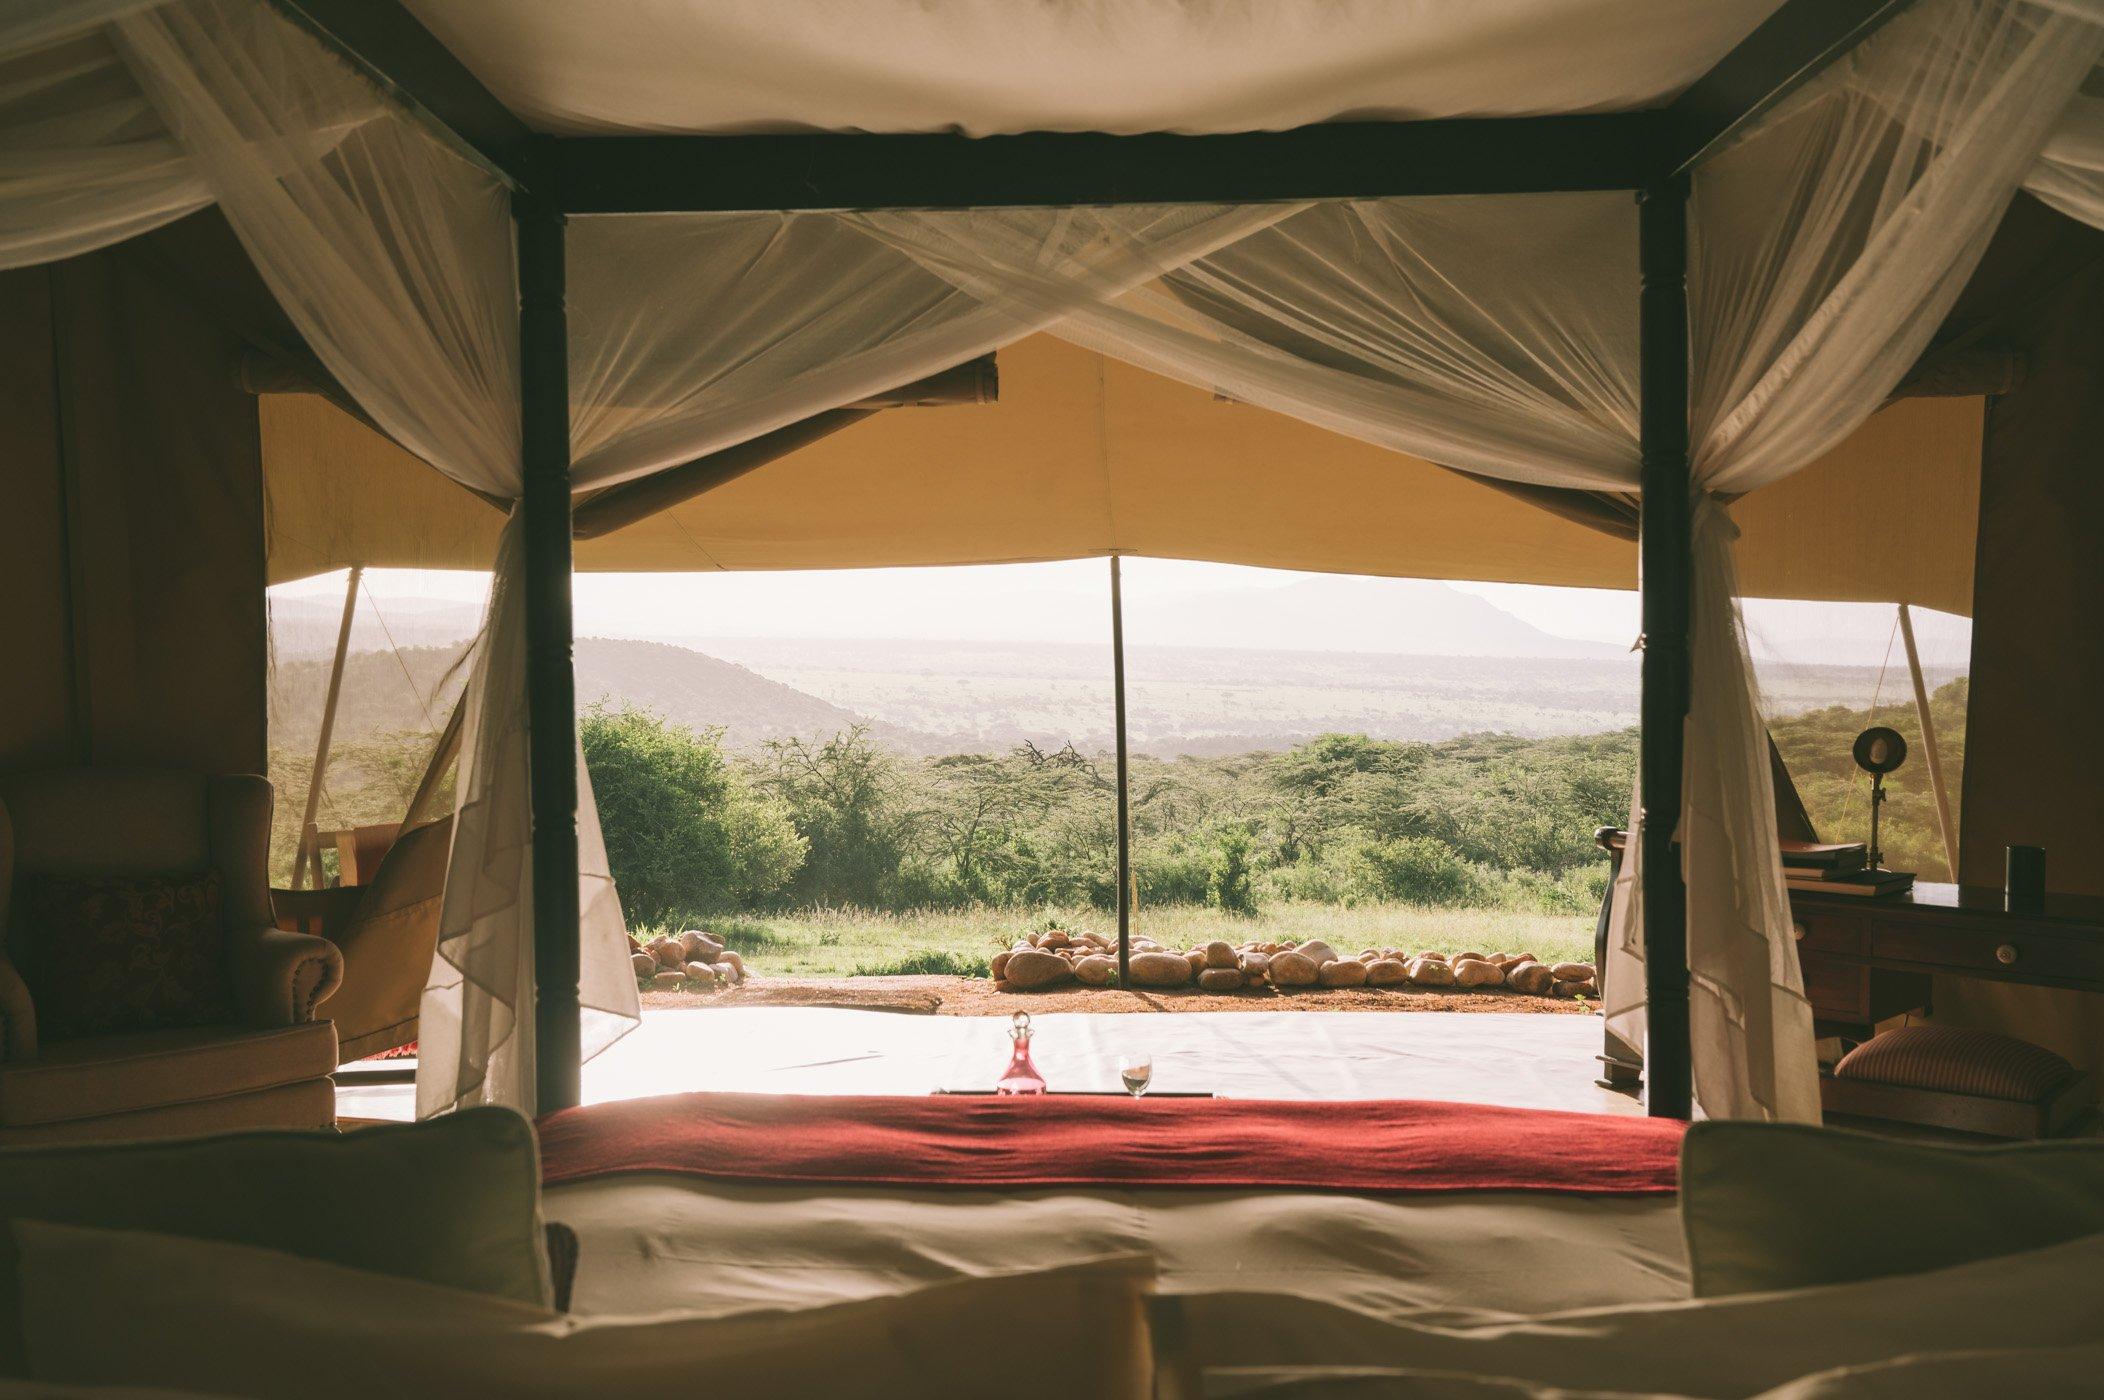 Cottar's 1920s safari camp in the Maasai Mara in Kenya